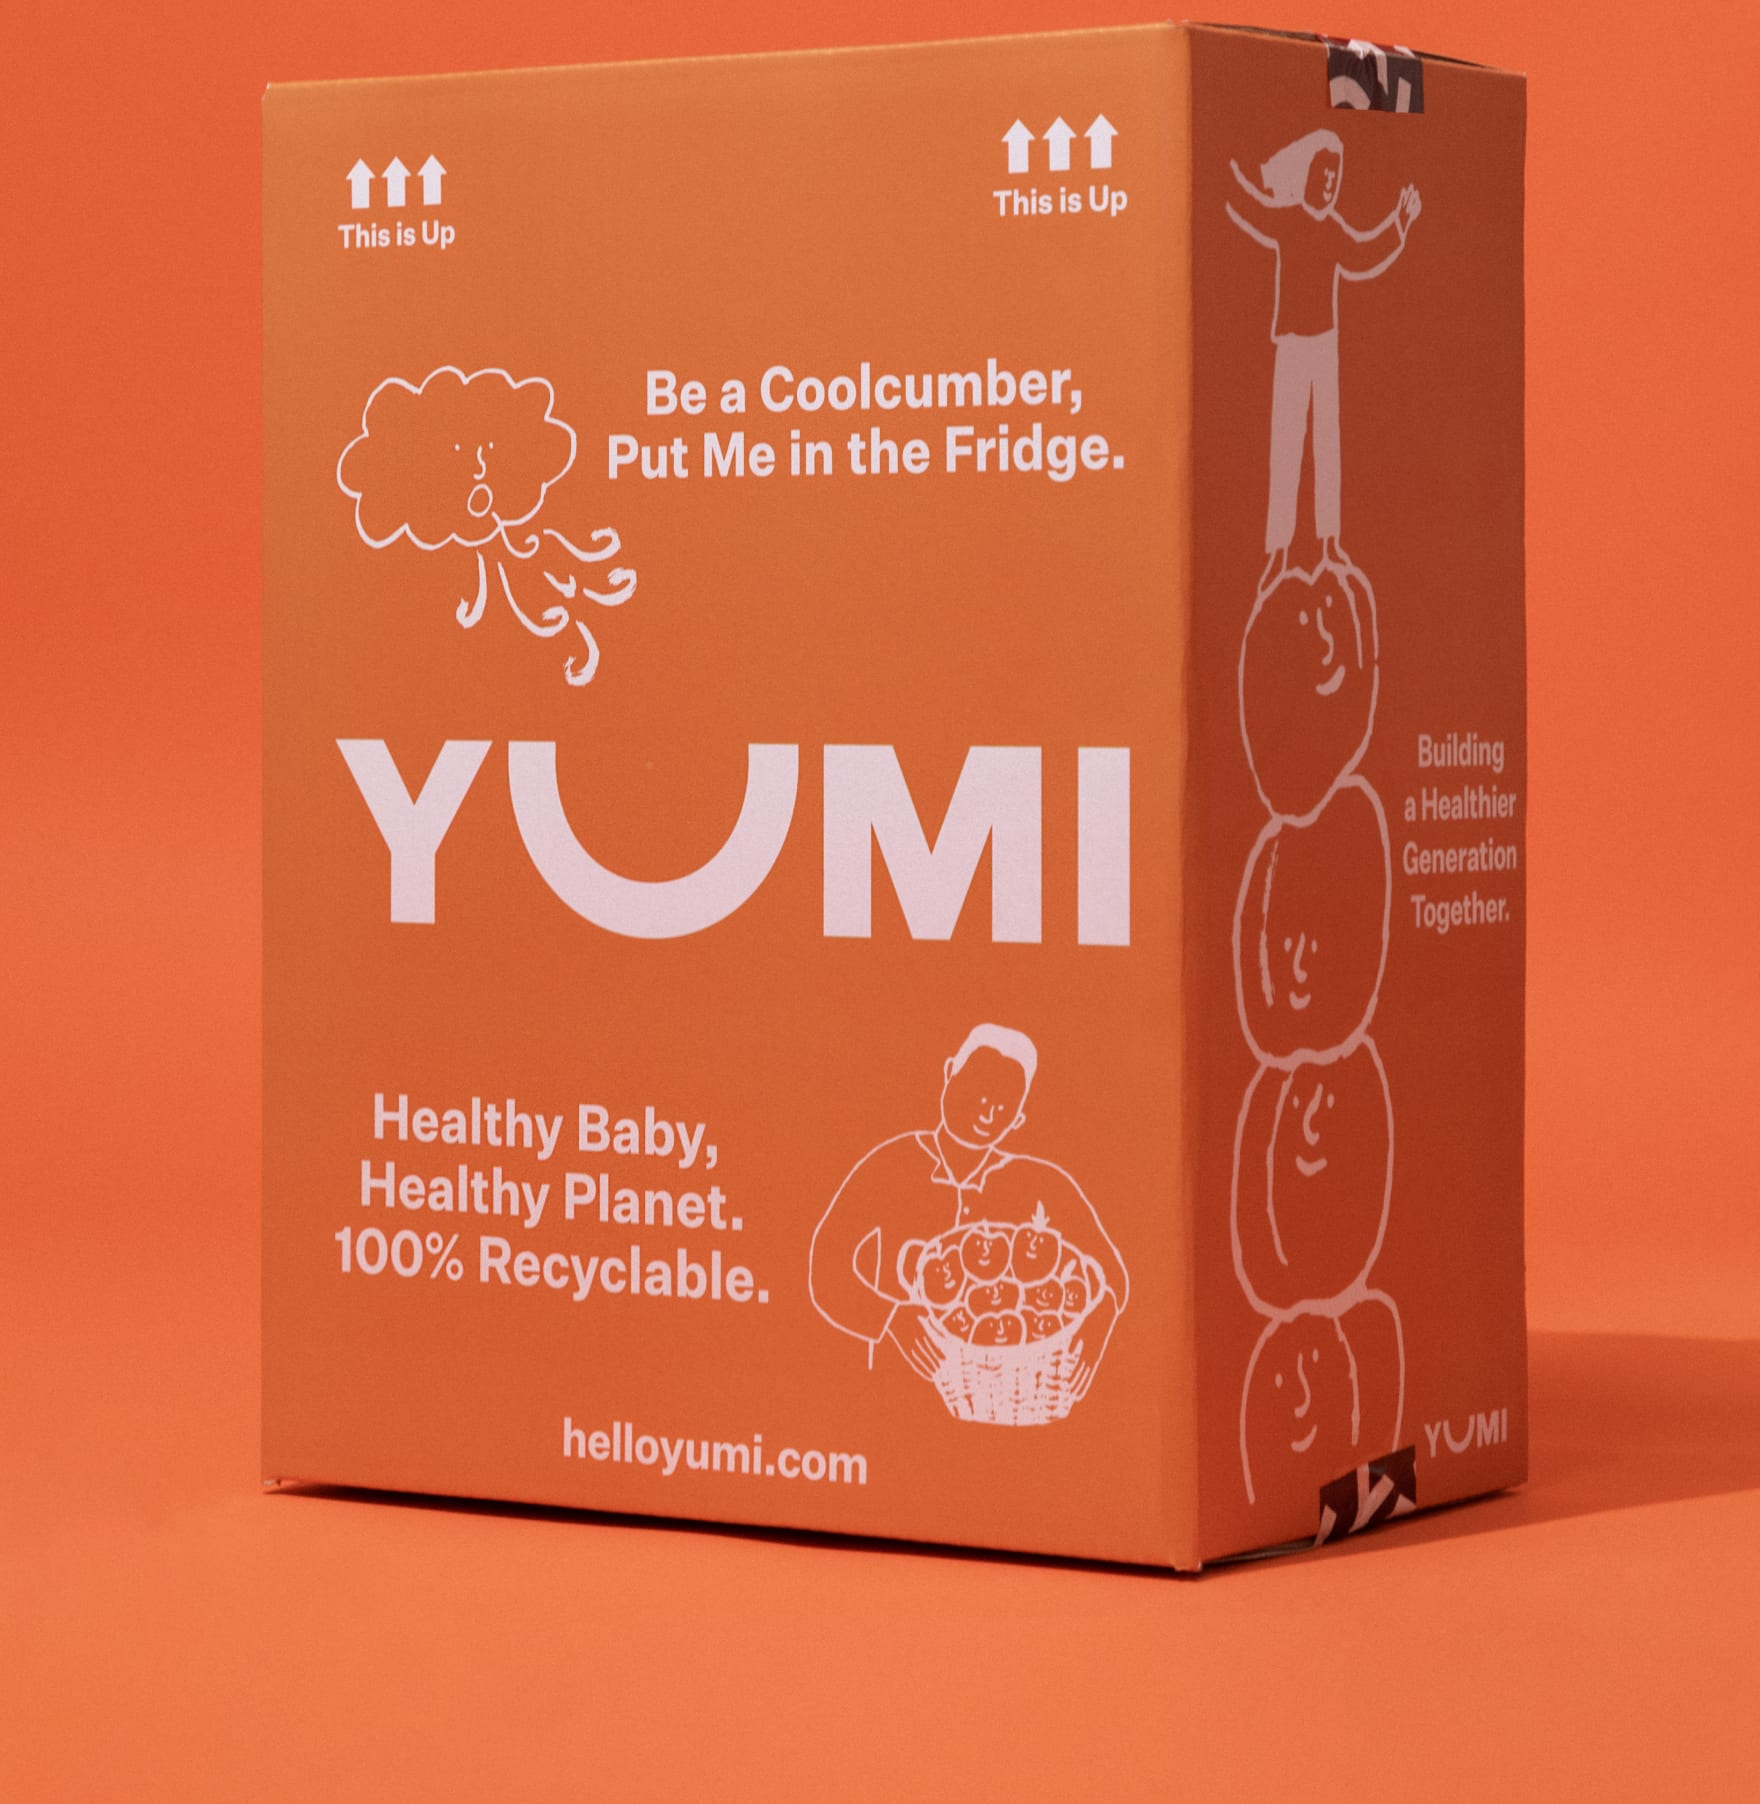 box of yumi food